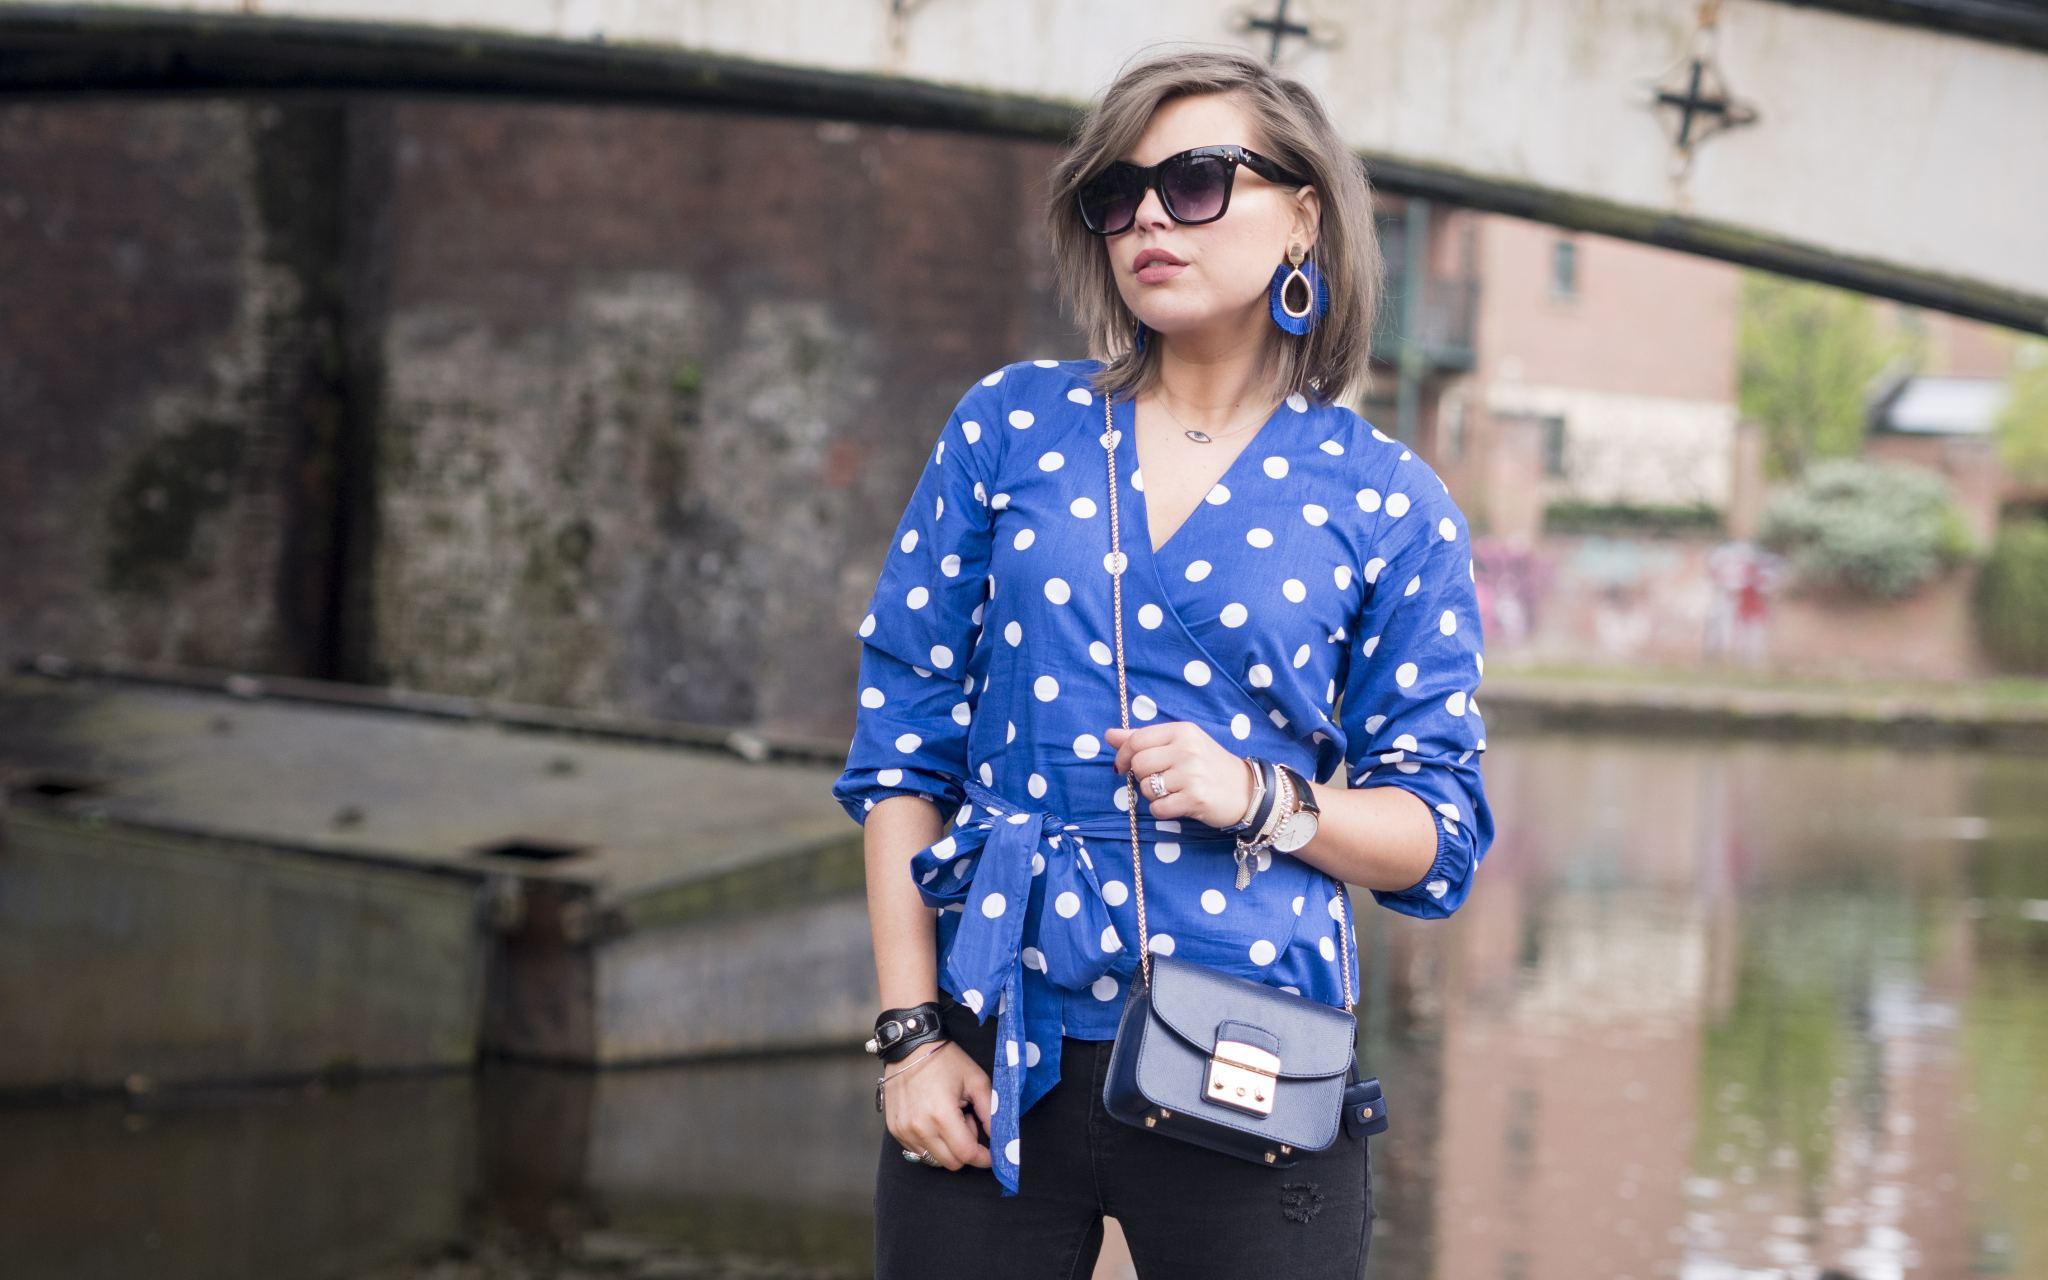 manchester fashion blogger, manchester fashion, fashion blogger, Ipanema x Philippe Starck